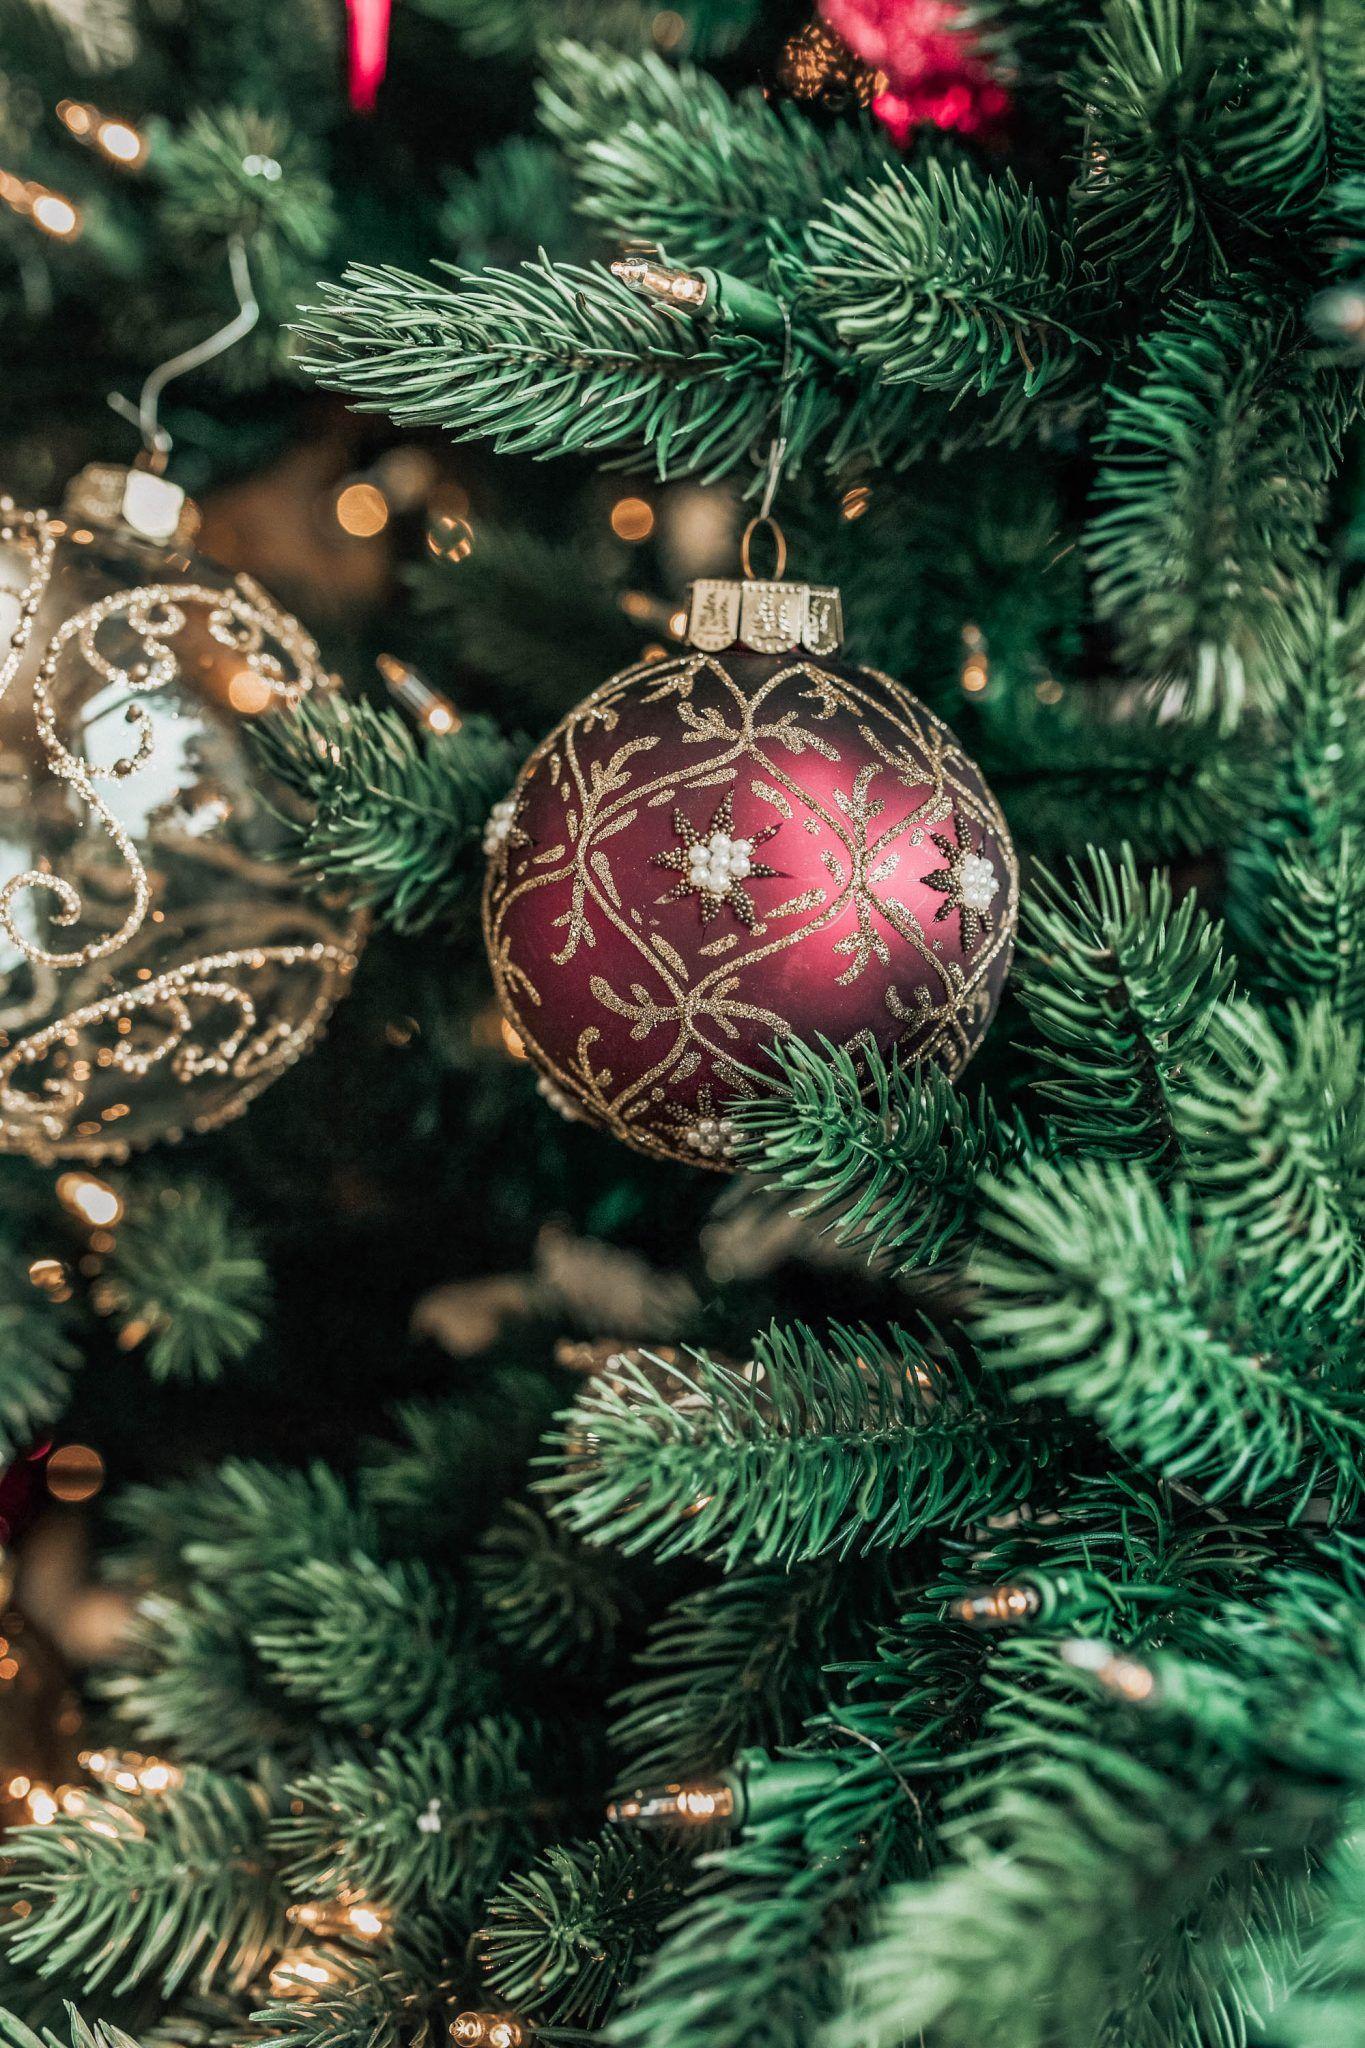 Decorating at the Biltmore   Christmas decorations, White xmas tree, Christmas